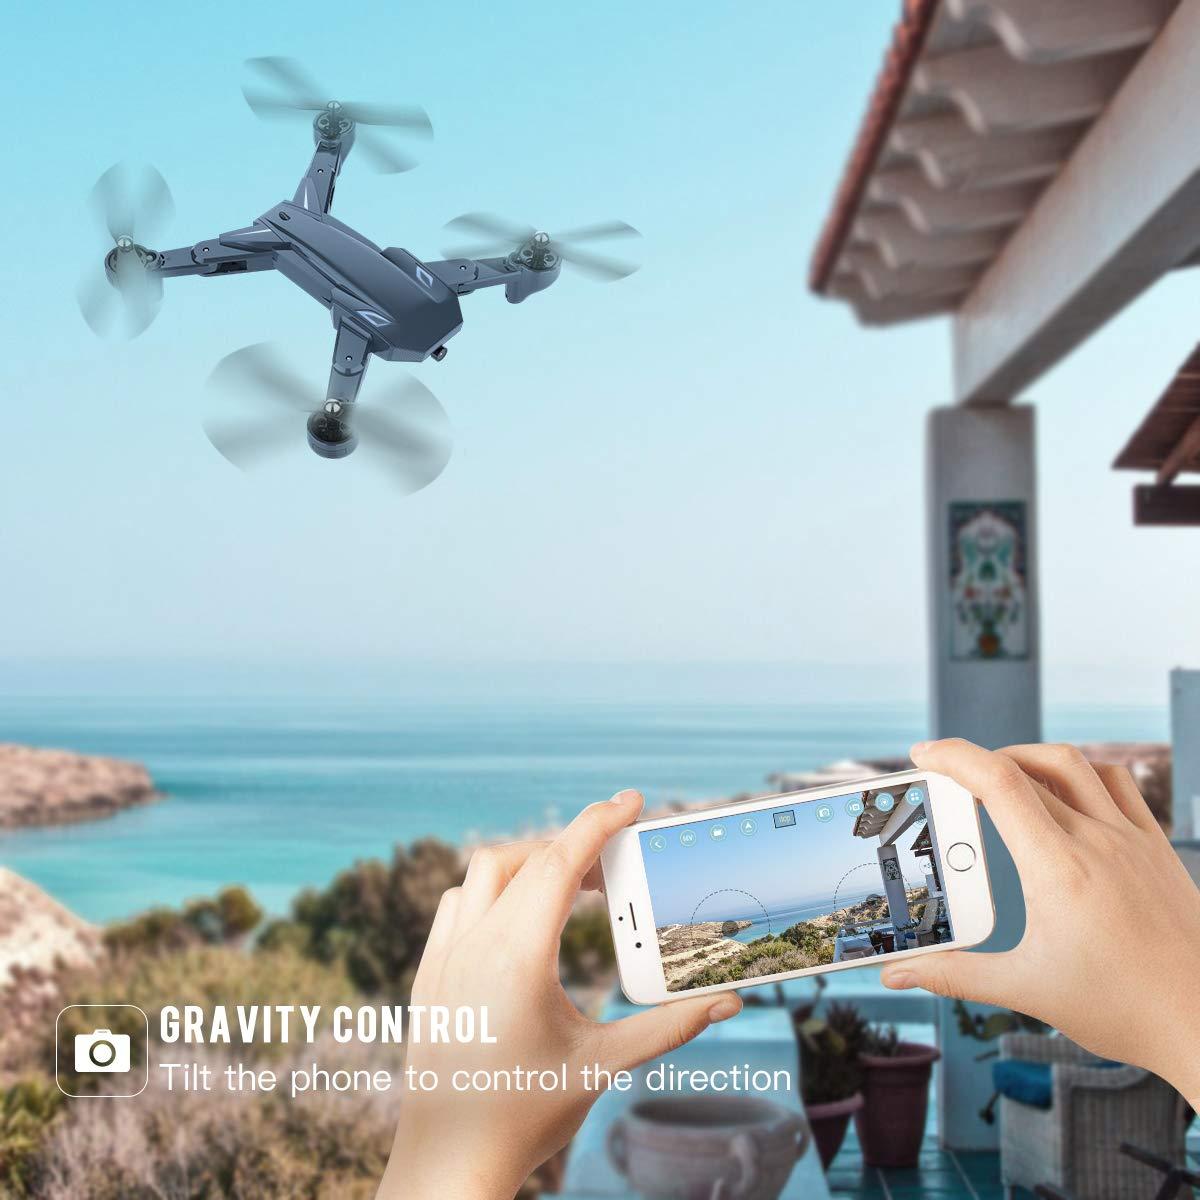 Supkiir Drone Gravity Control